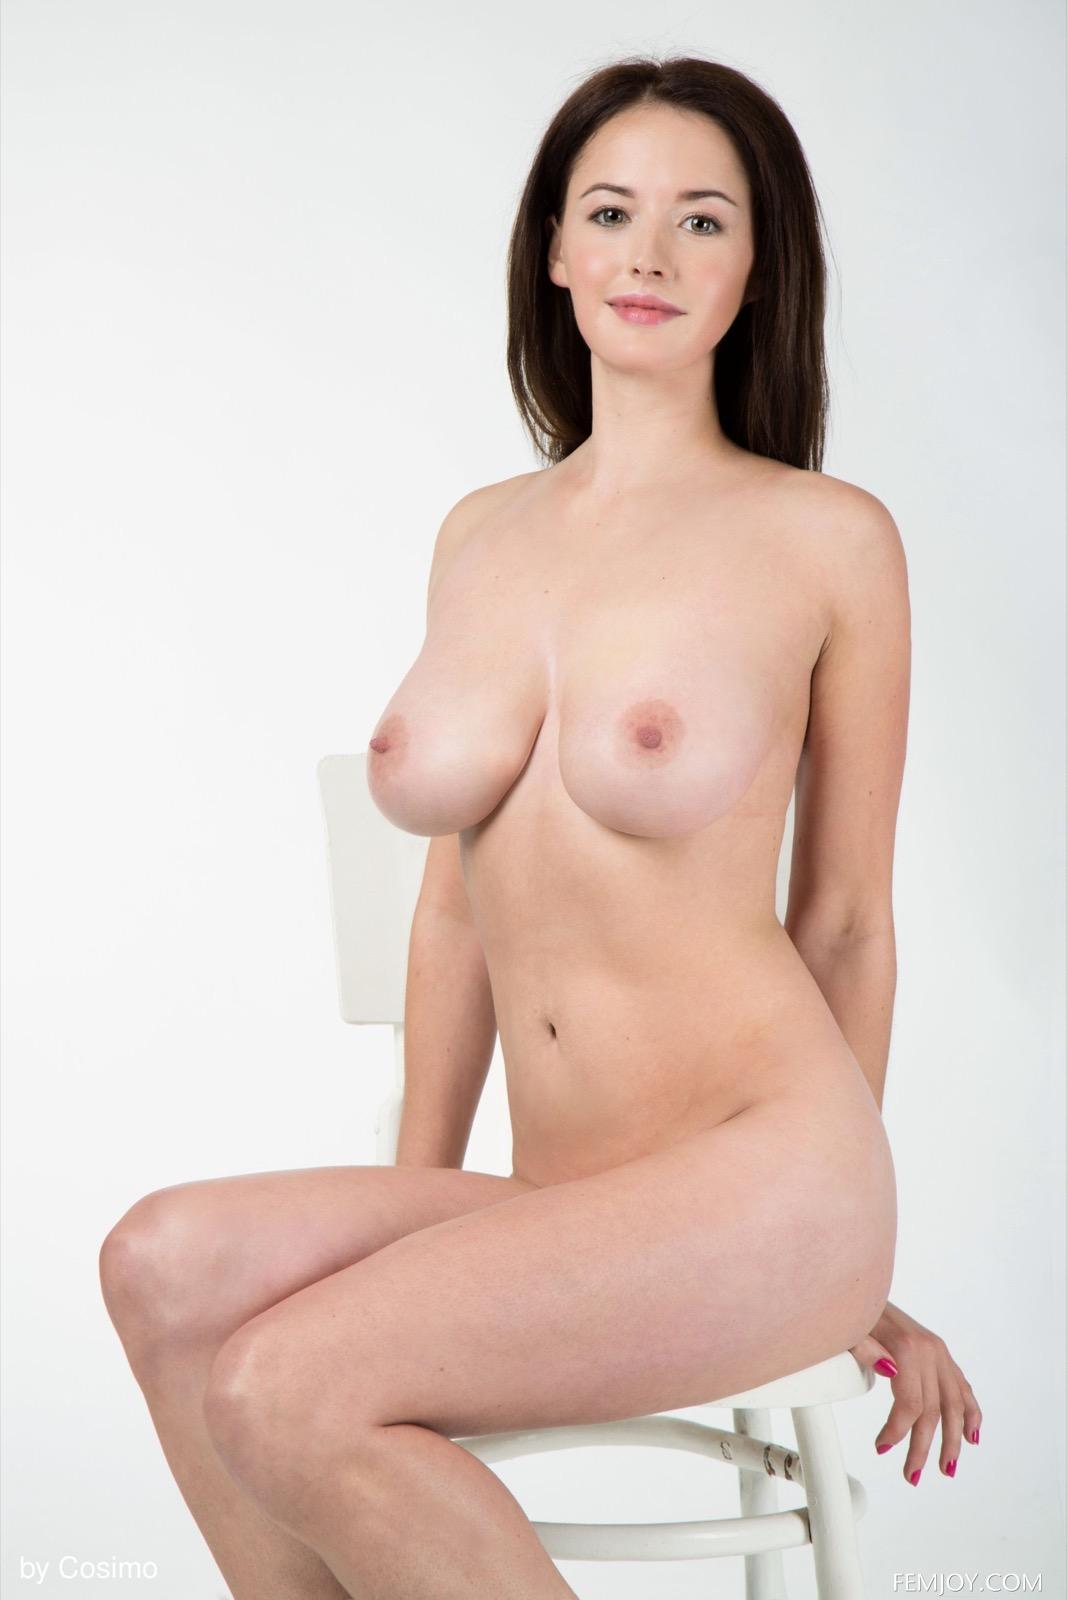 mika_g_25_30885_8.jpg